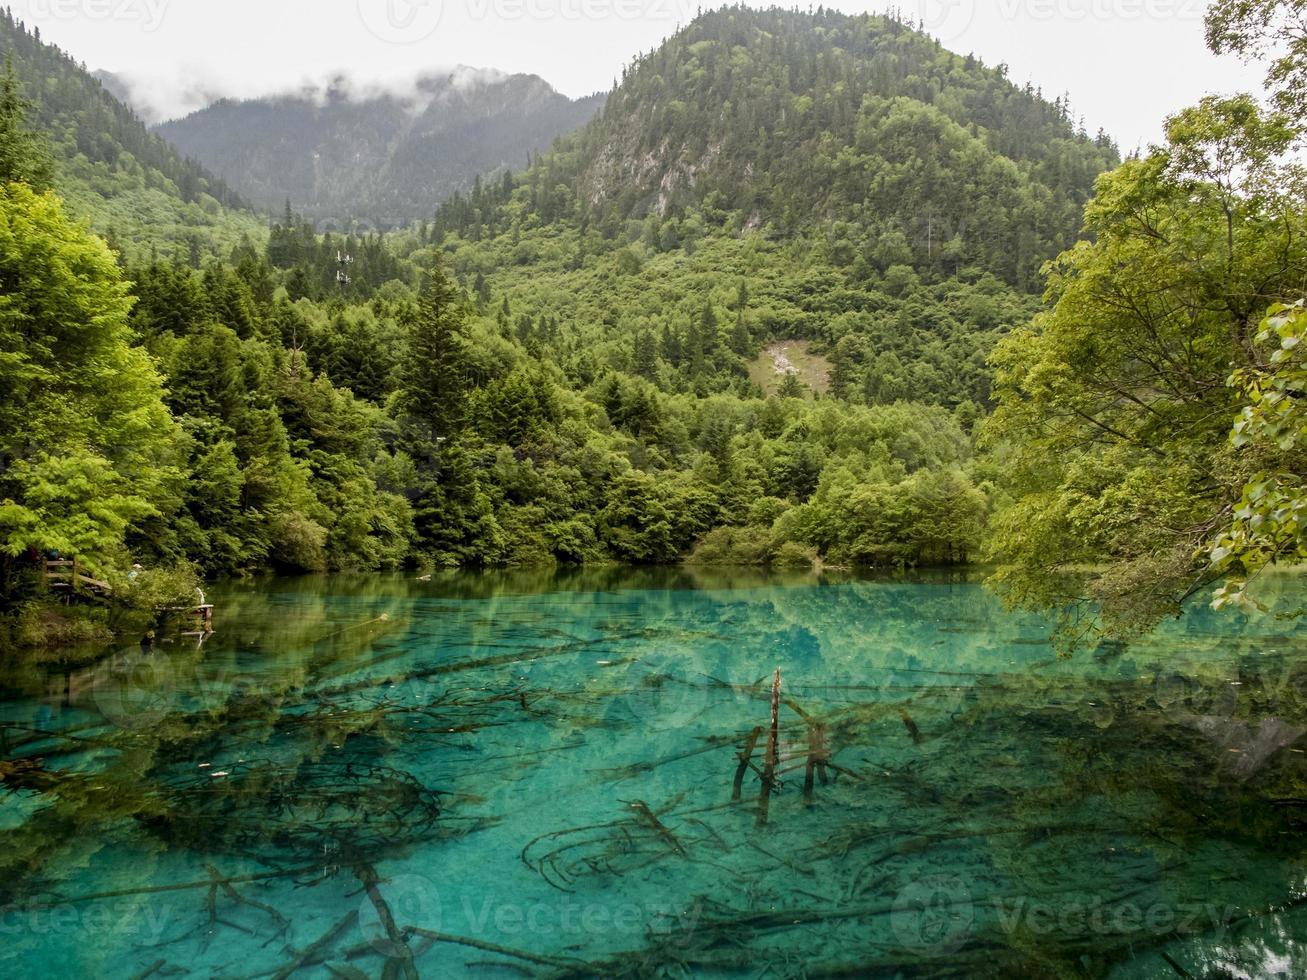 jiuzhaigou vallei nationaal park in china foto